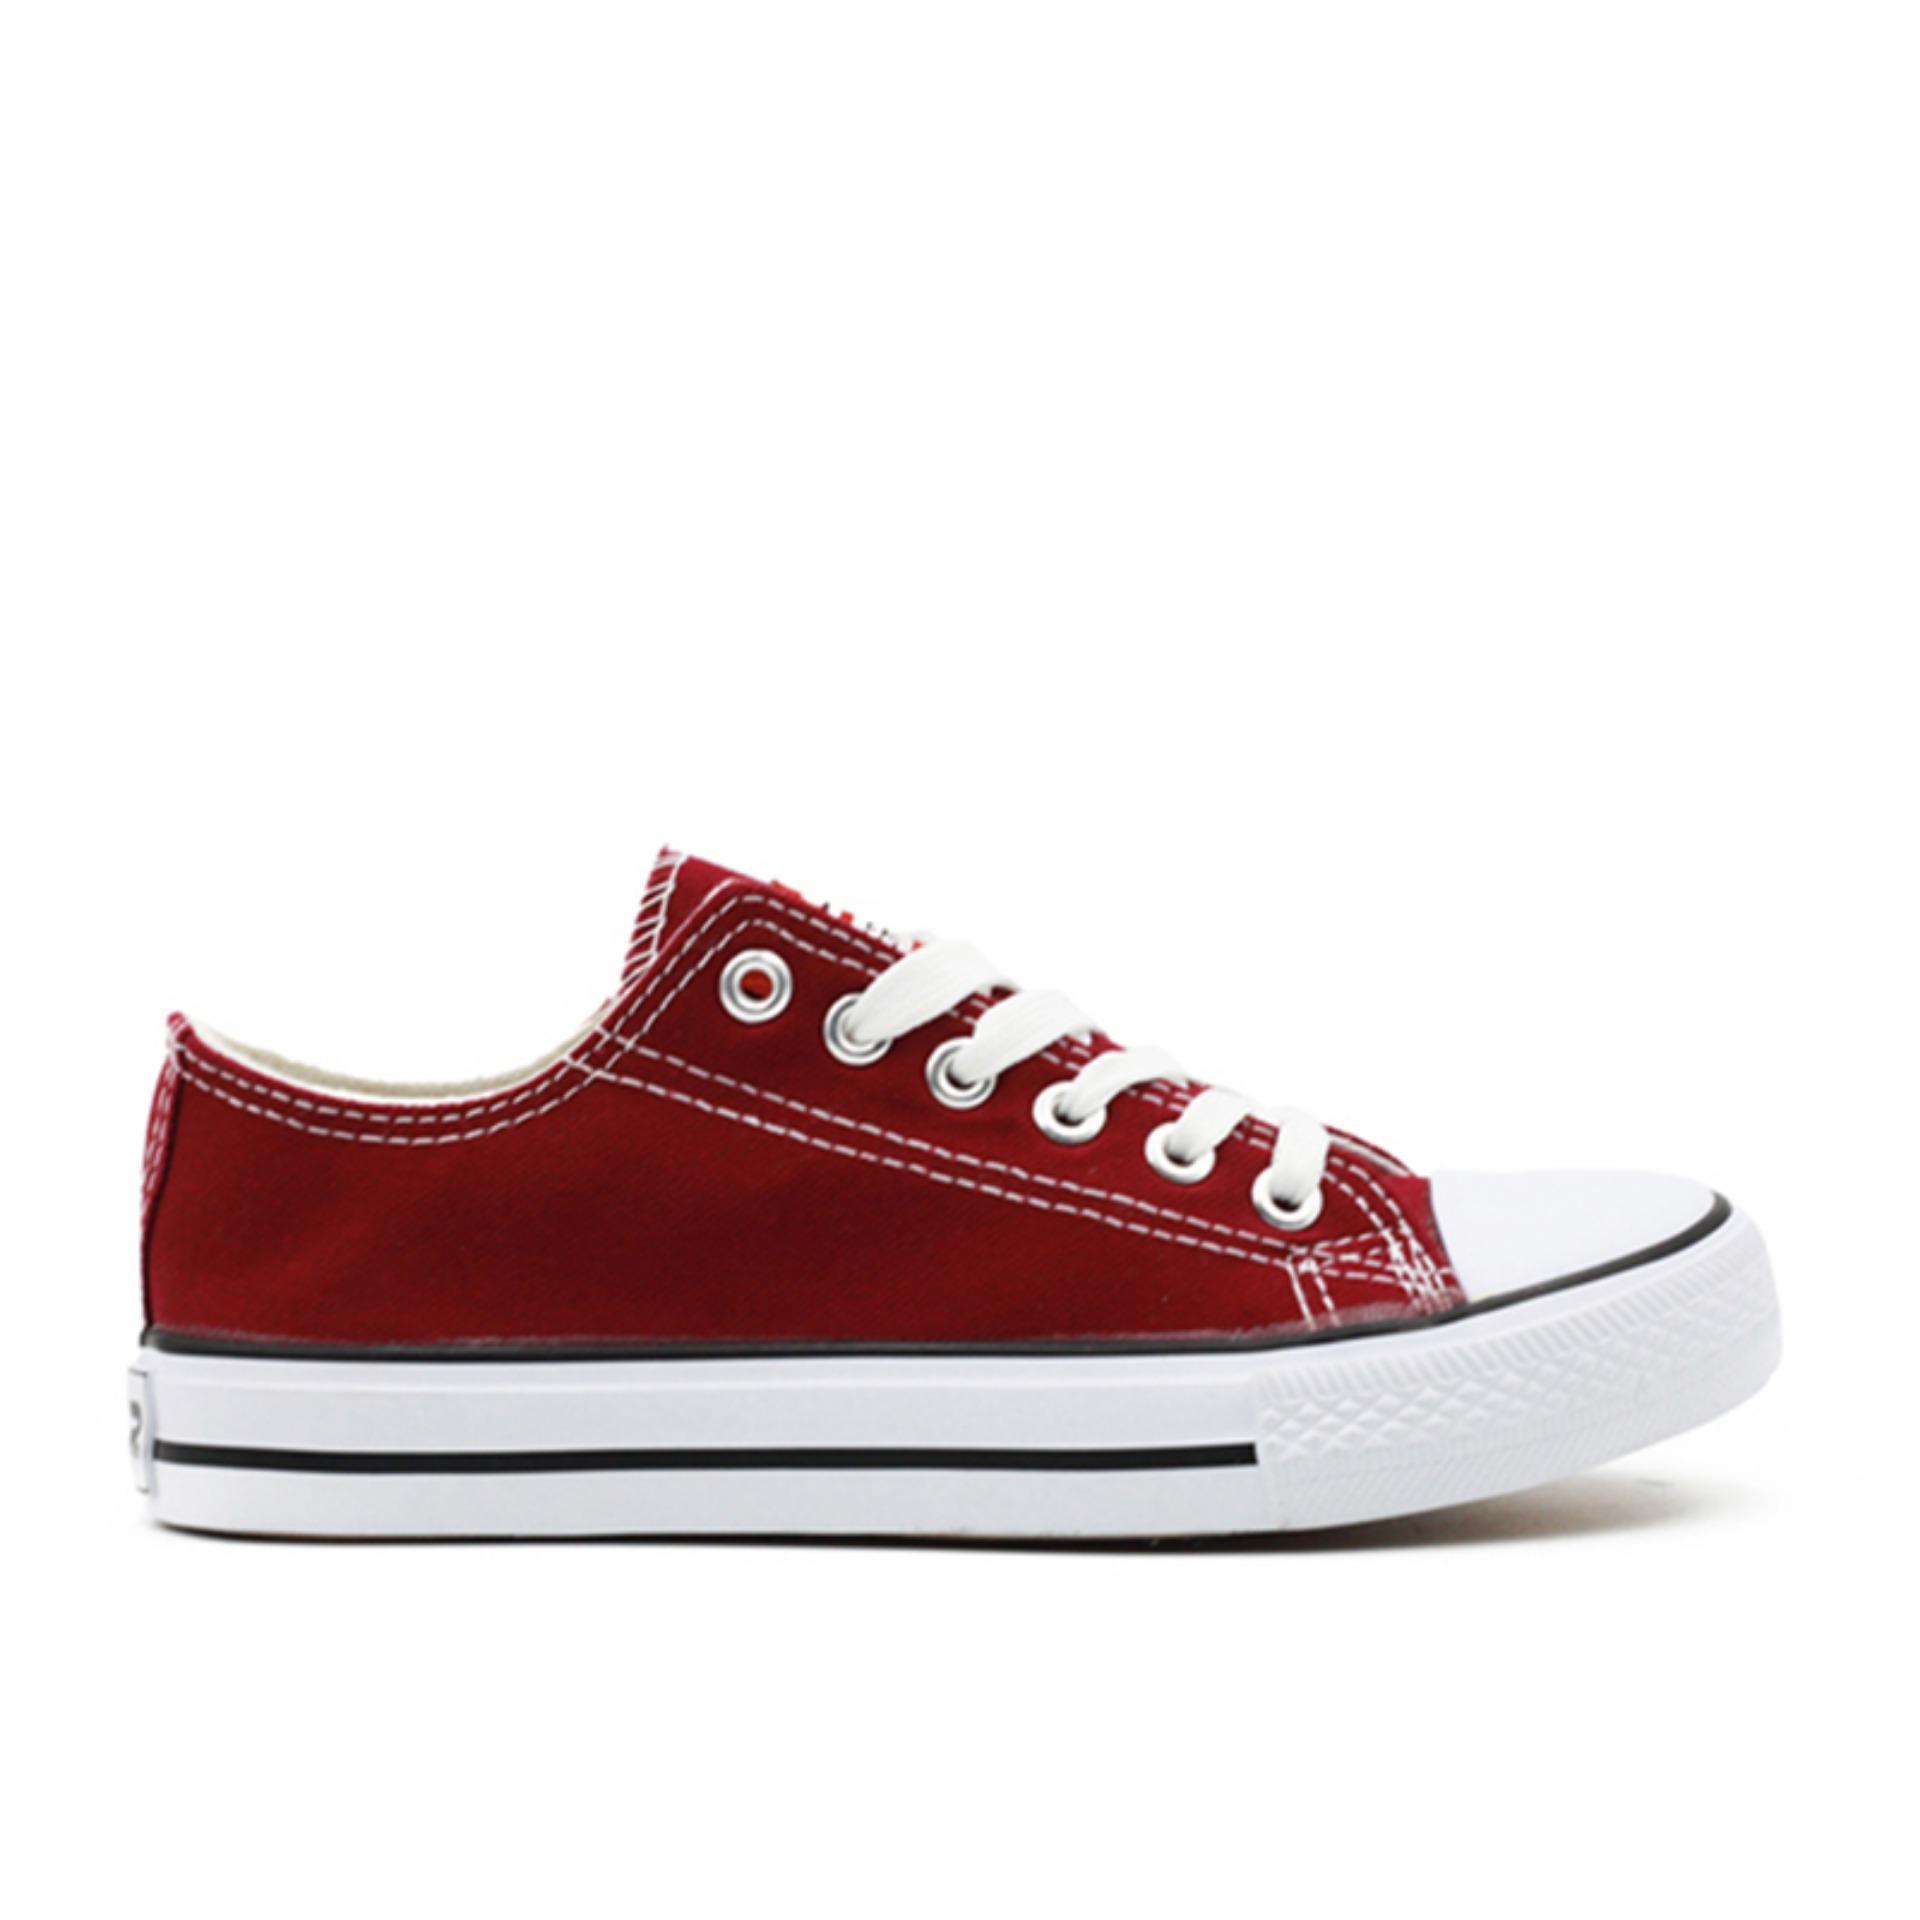 Faster Sepatu Sneakers Kanvas Wanita 1603-03 - Maroon .